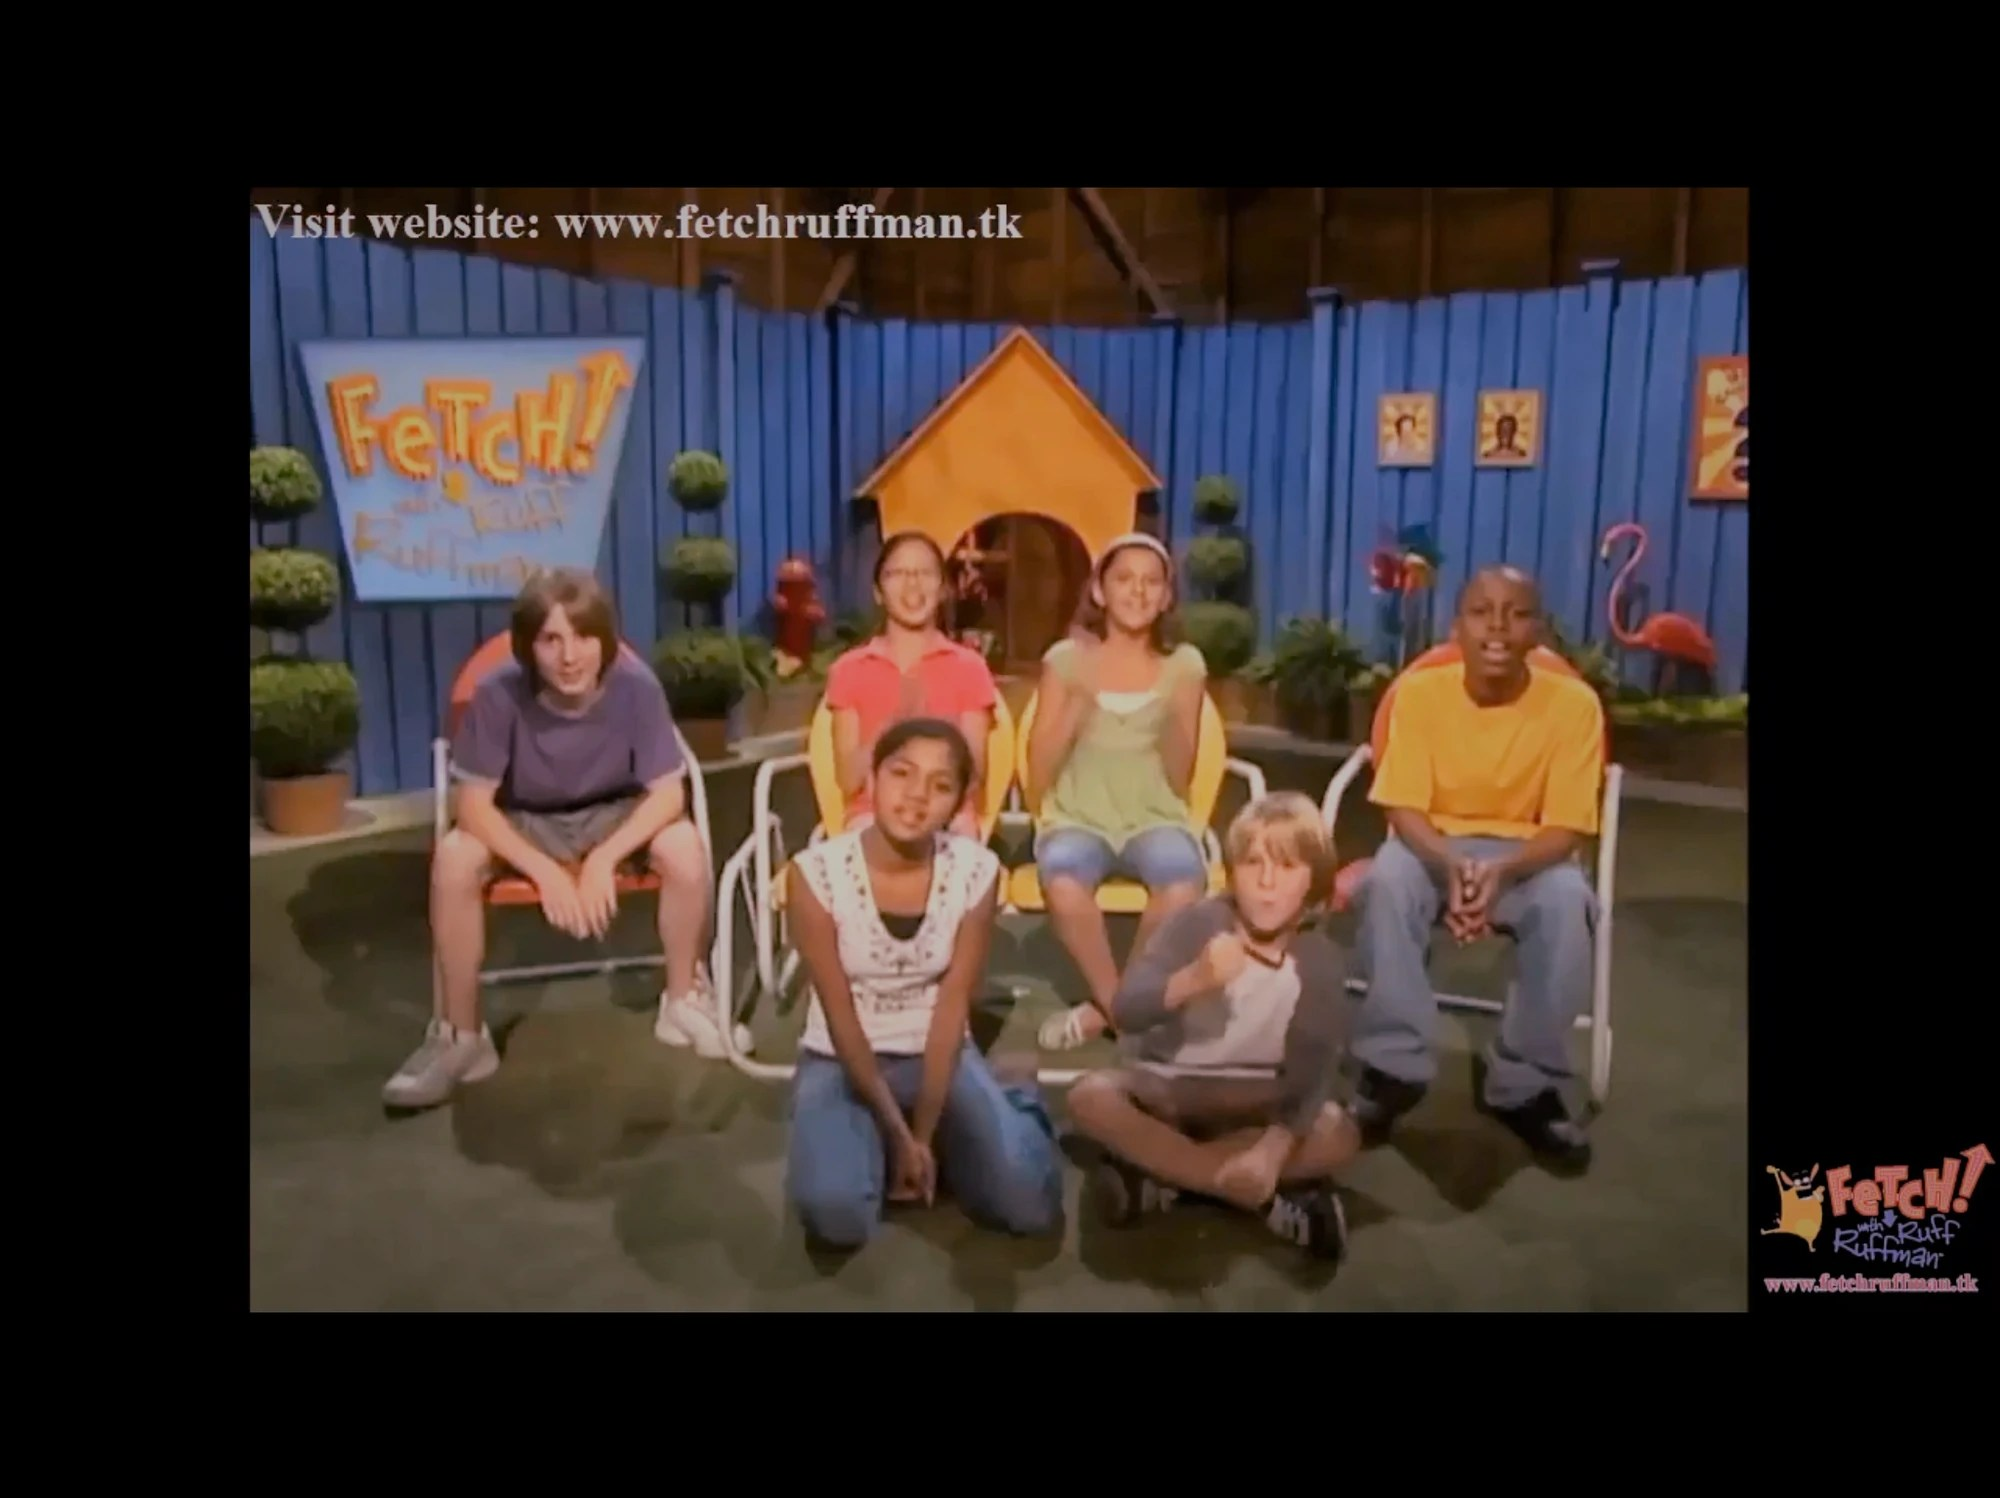 Fetch With Ruff Ruffman Season 5 Episode 006 - Year of Clean